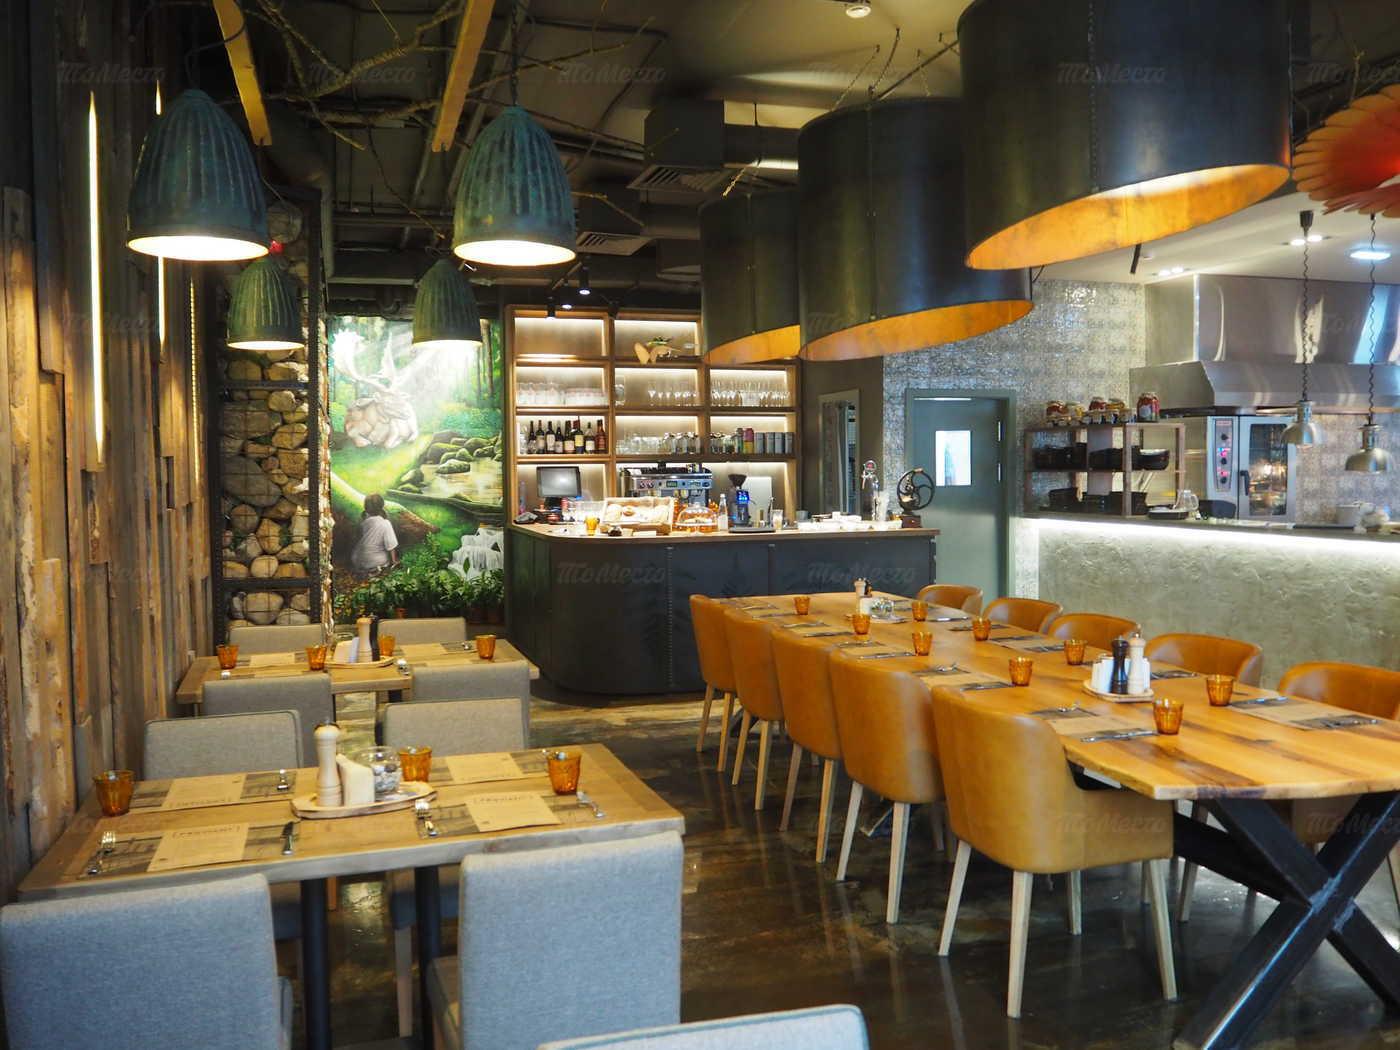 Ресторан Провиант (Proviant) на улице Академика Павлова фото 3